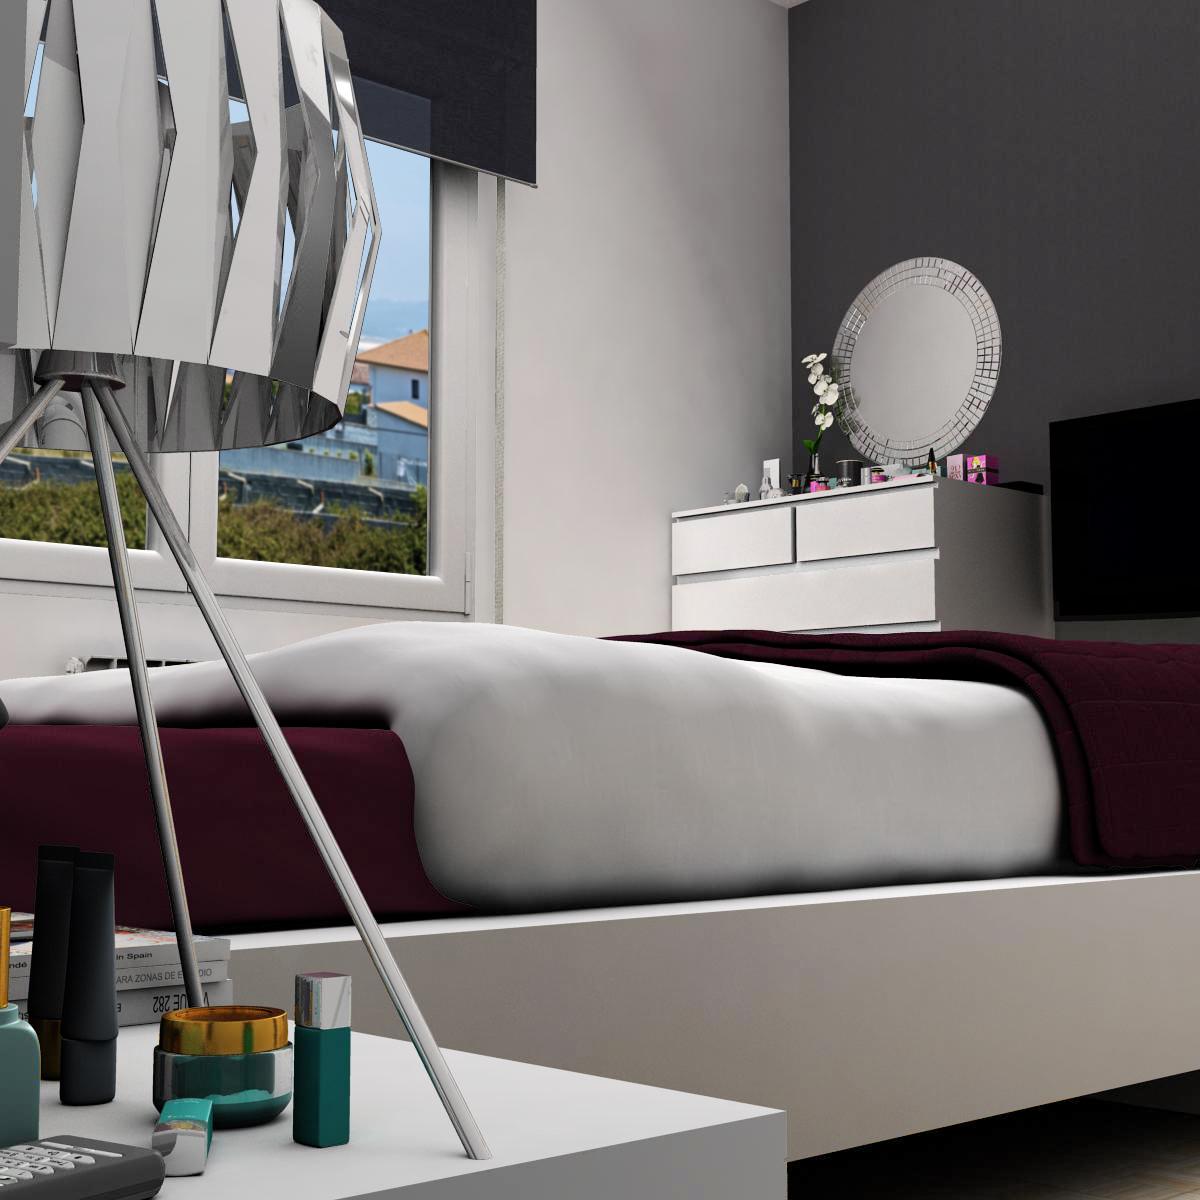 guļamistaba 8 3d modelis 3ds max fbx c4d ma mb obj 159565